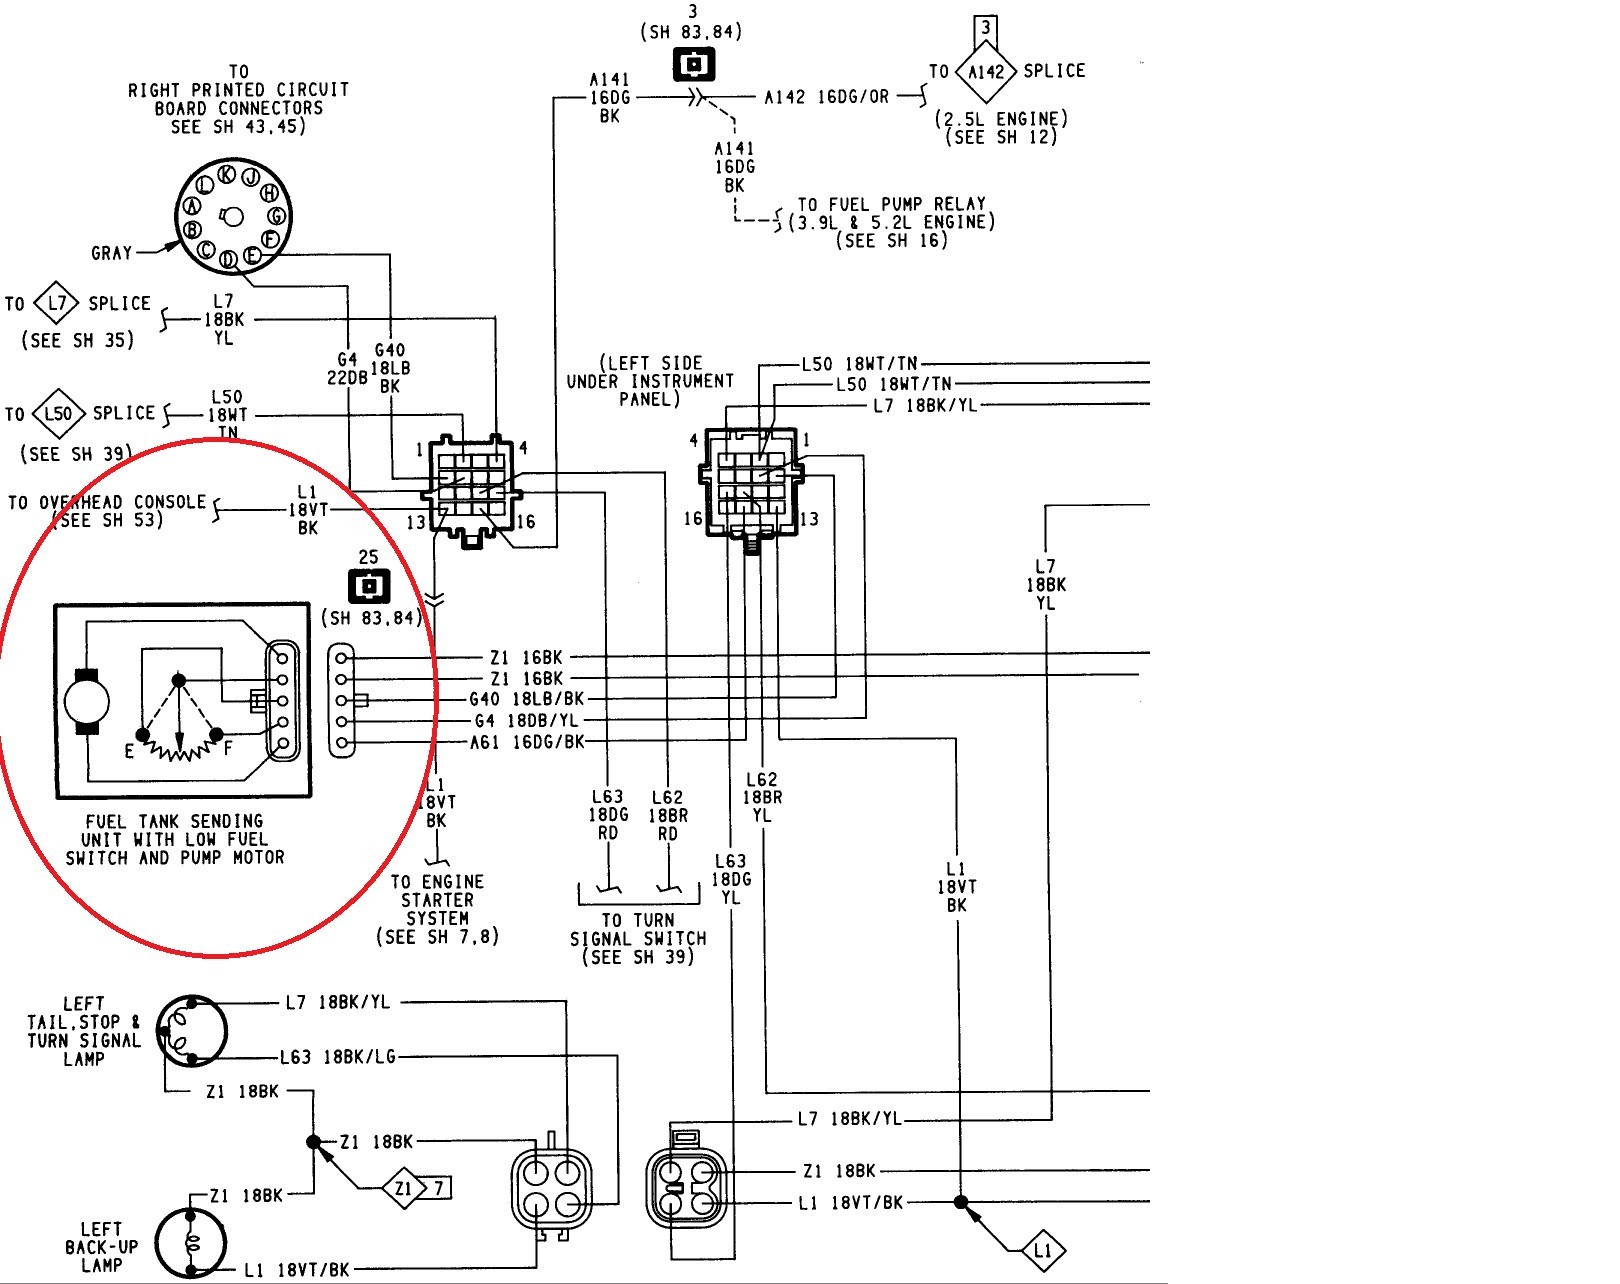 Headlight Schematics For 2000 Dodge Ram Worksheet And Wiring Diagram •